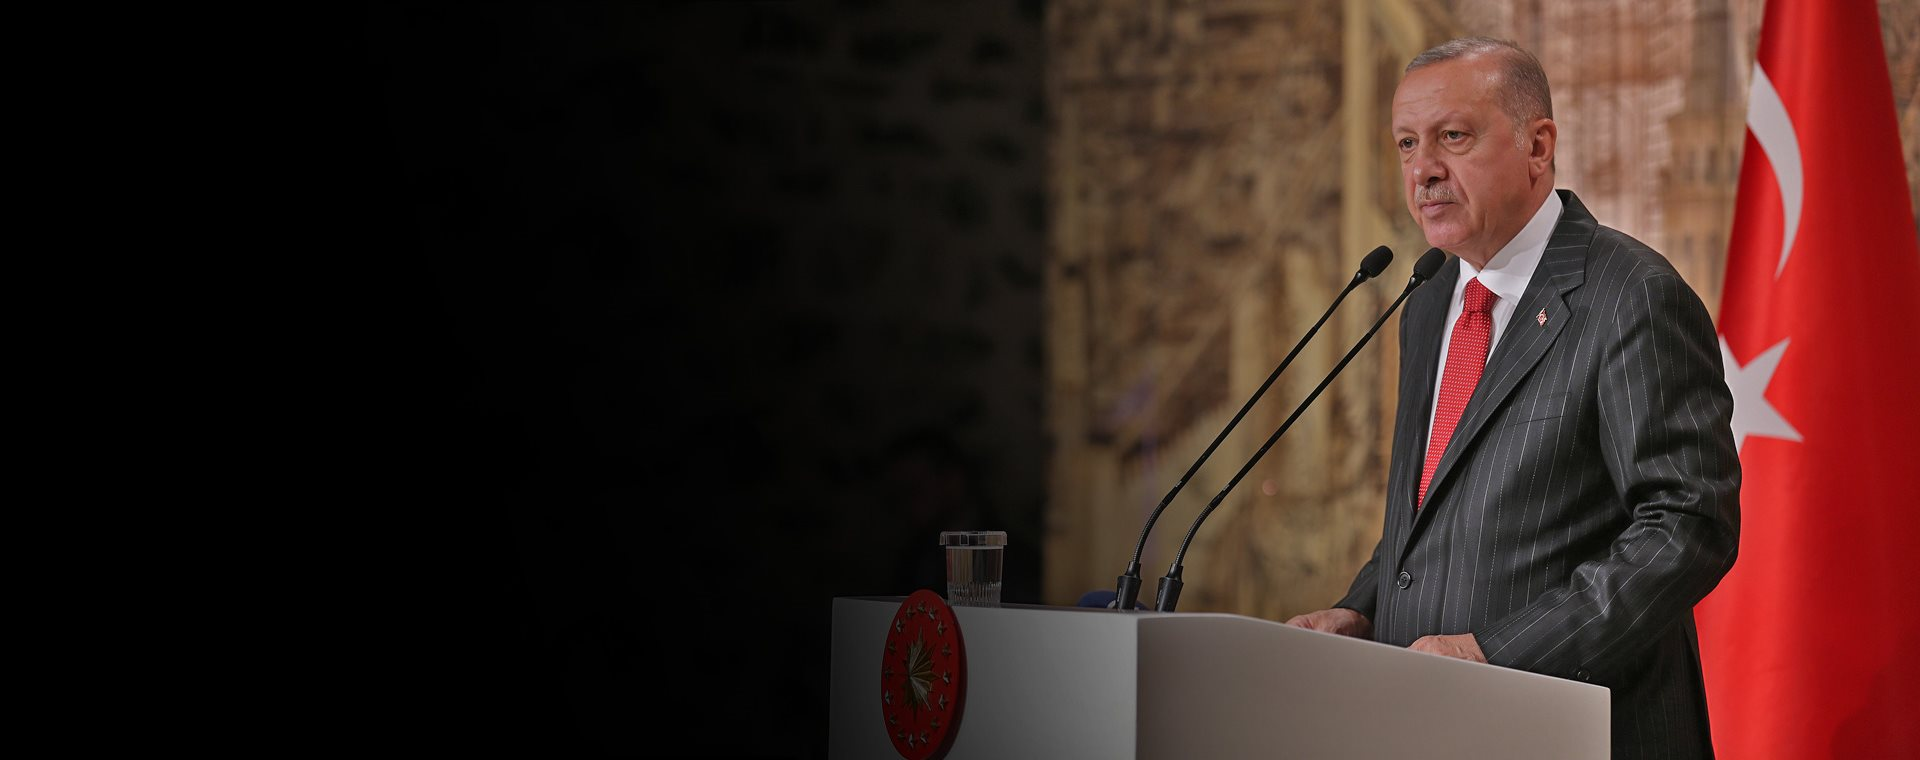 erdogan-syria-arthro